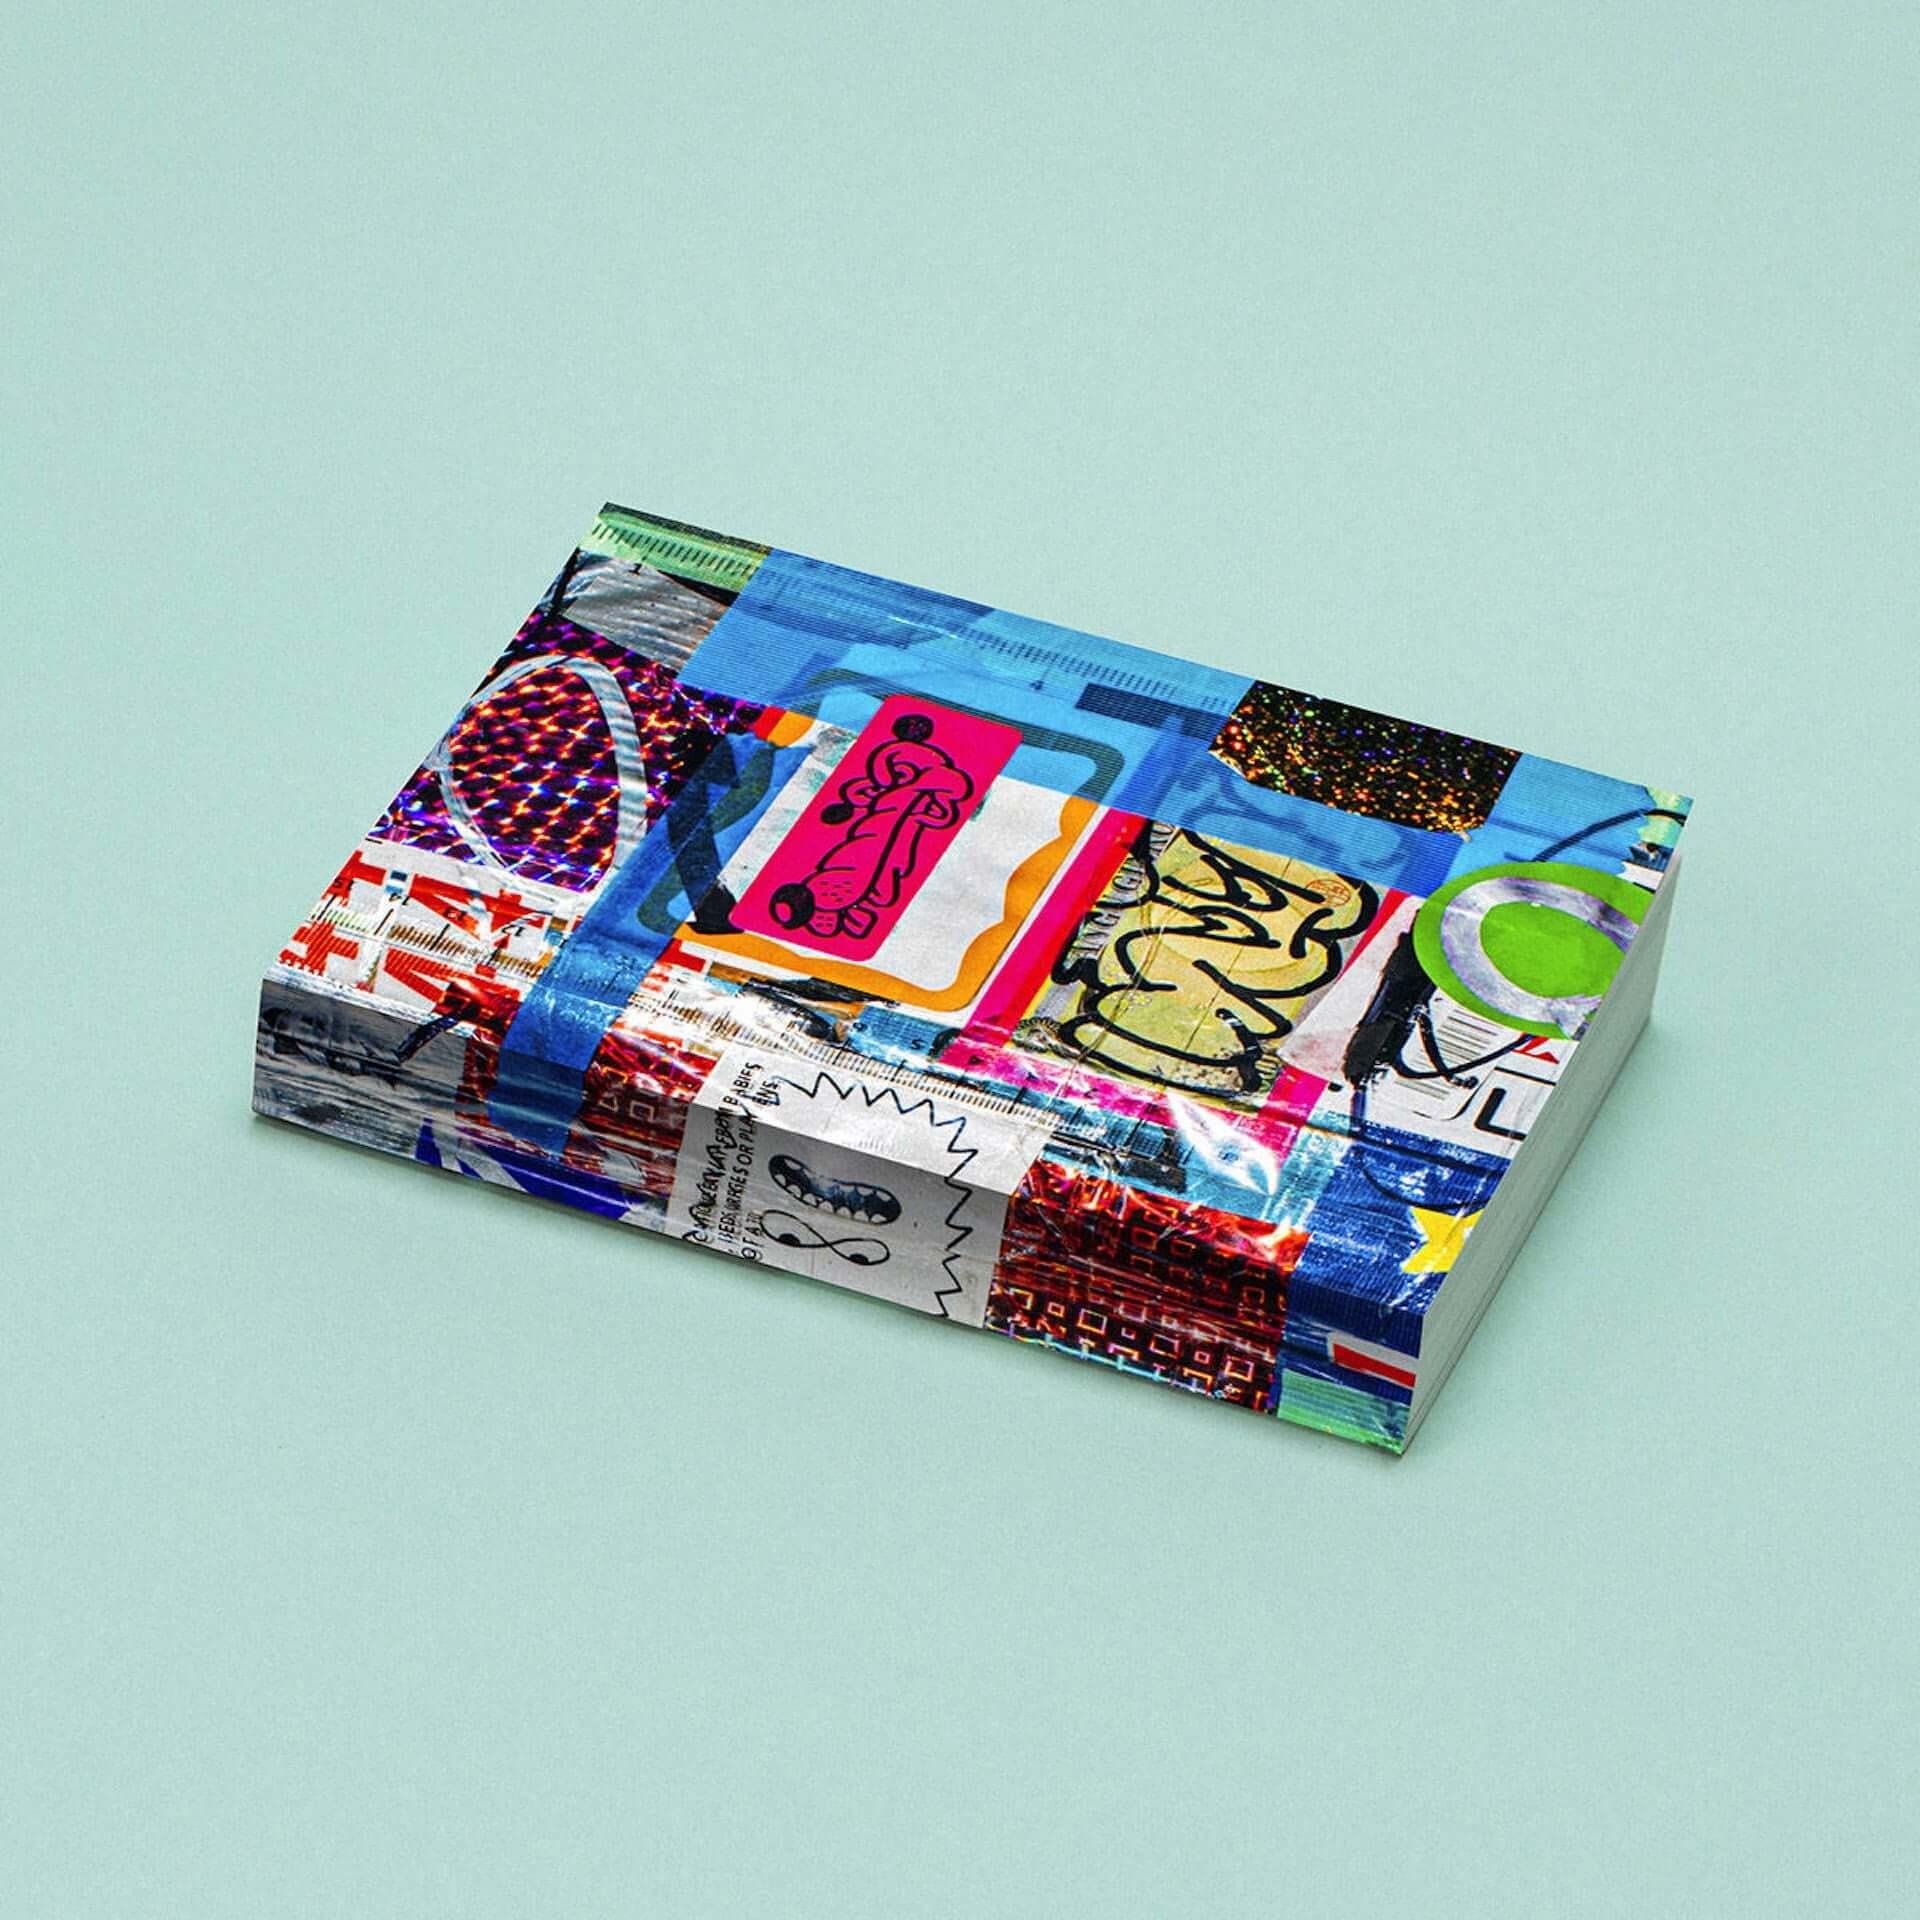 LAID BUGによる期間限定ポップアップショップが福岡の六本松 蔦屋書店「吉嗣商店」にて開催決定! art210330_laidbug_22-1920x1920